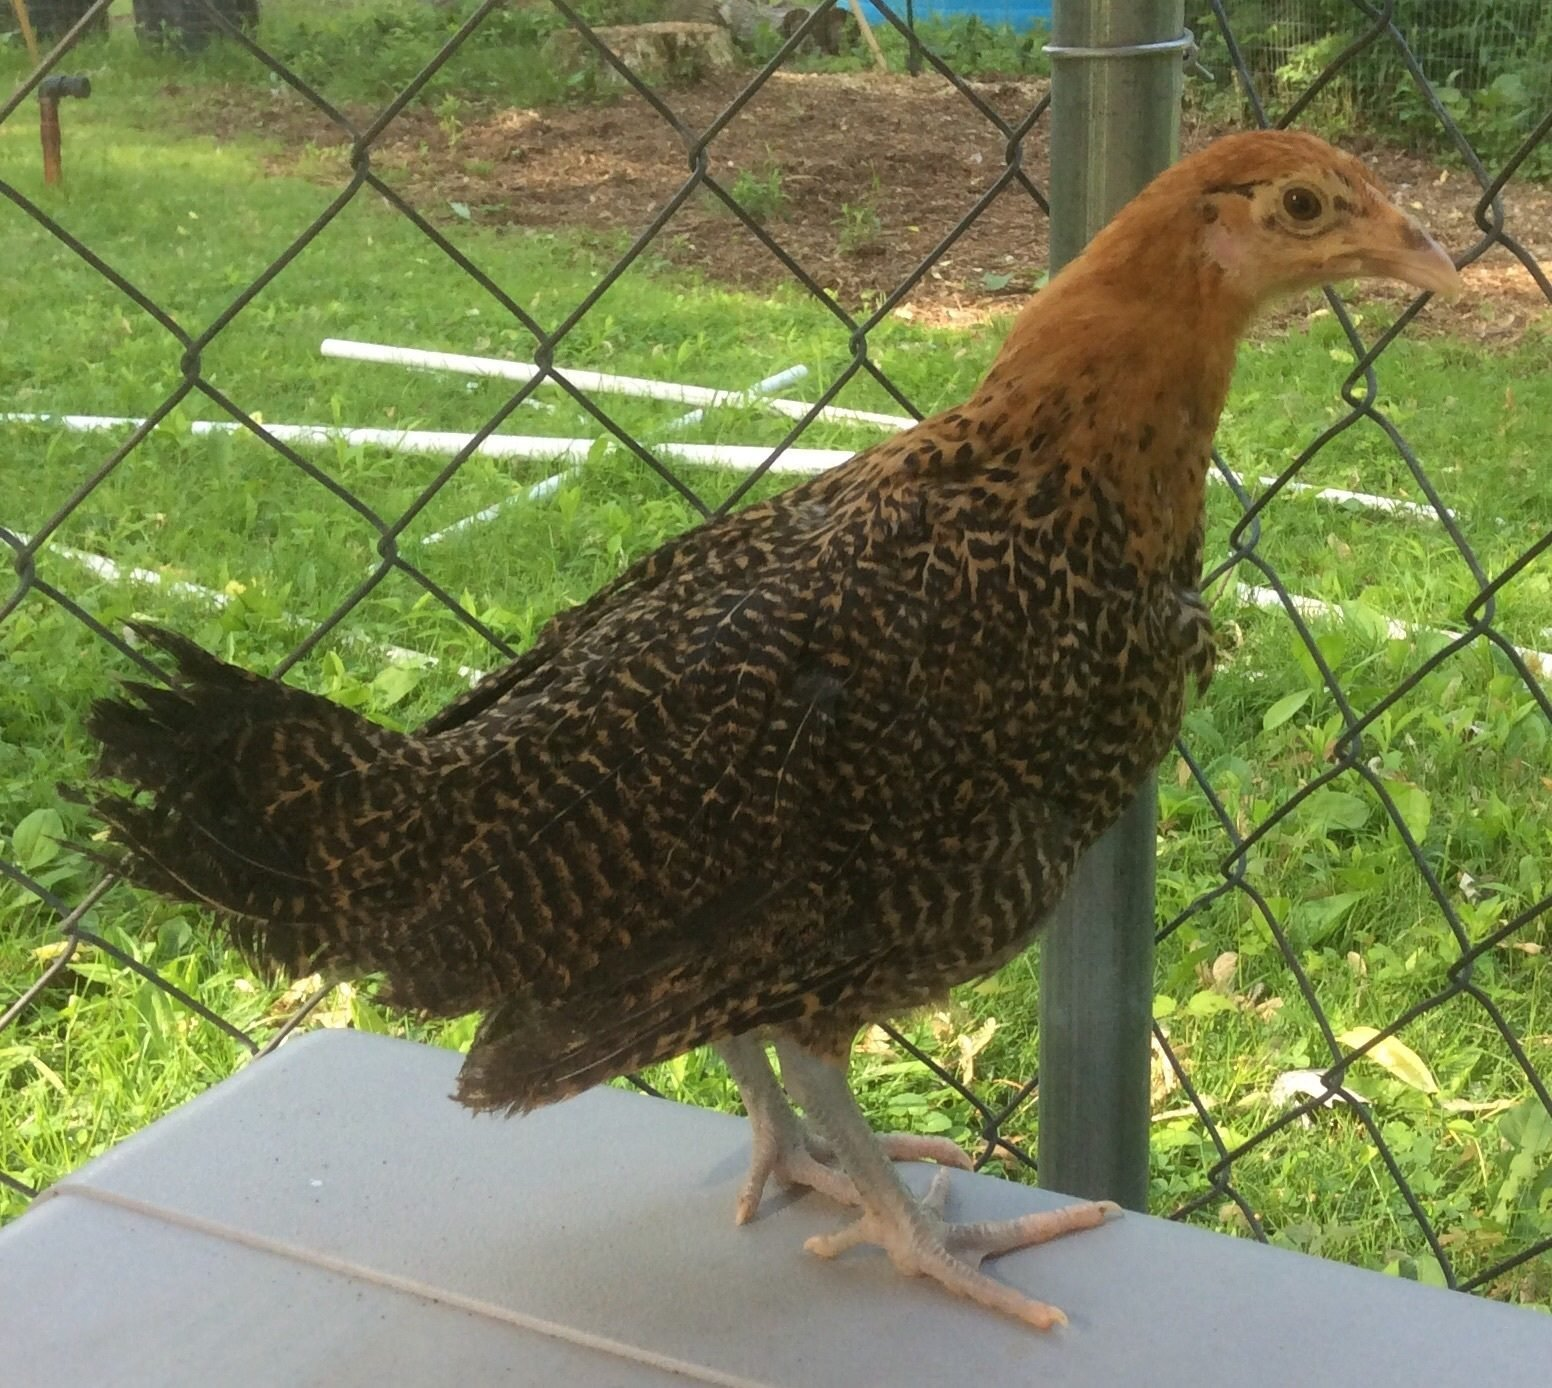 golden campine or golden penciled hamburg backyard chickens